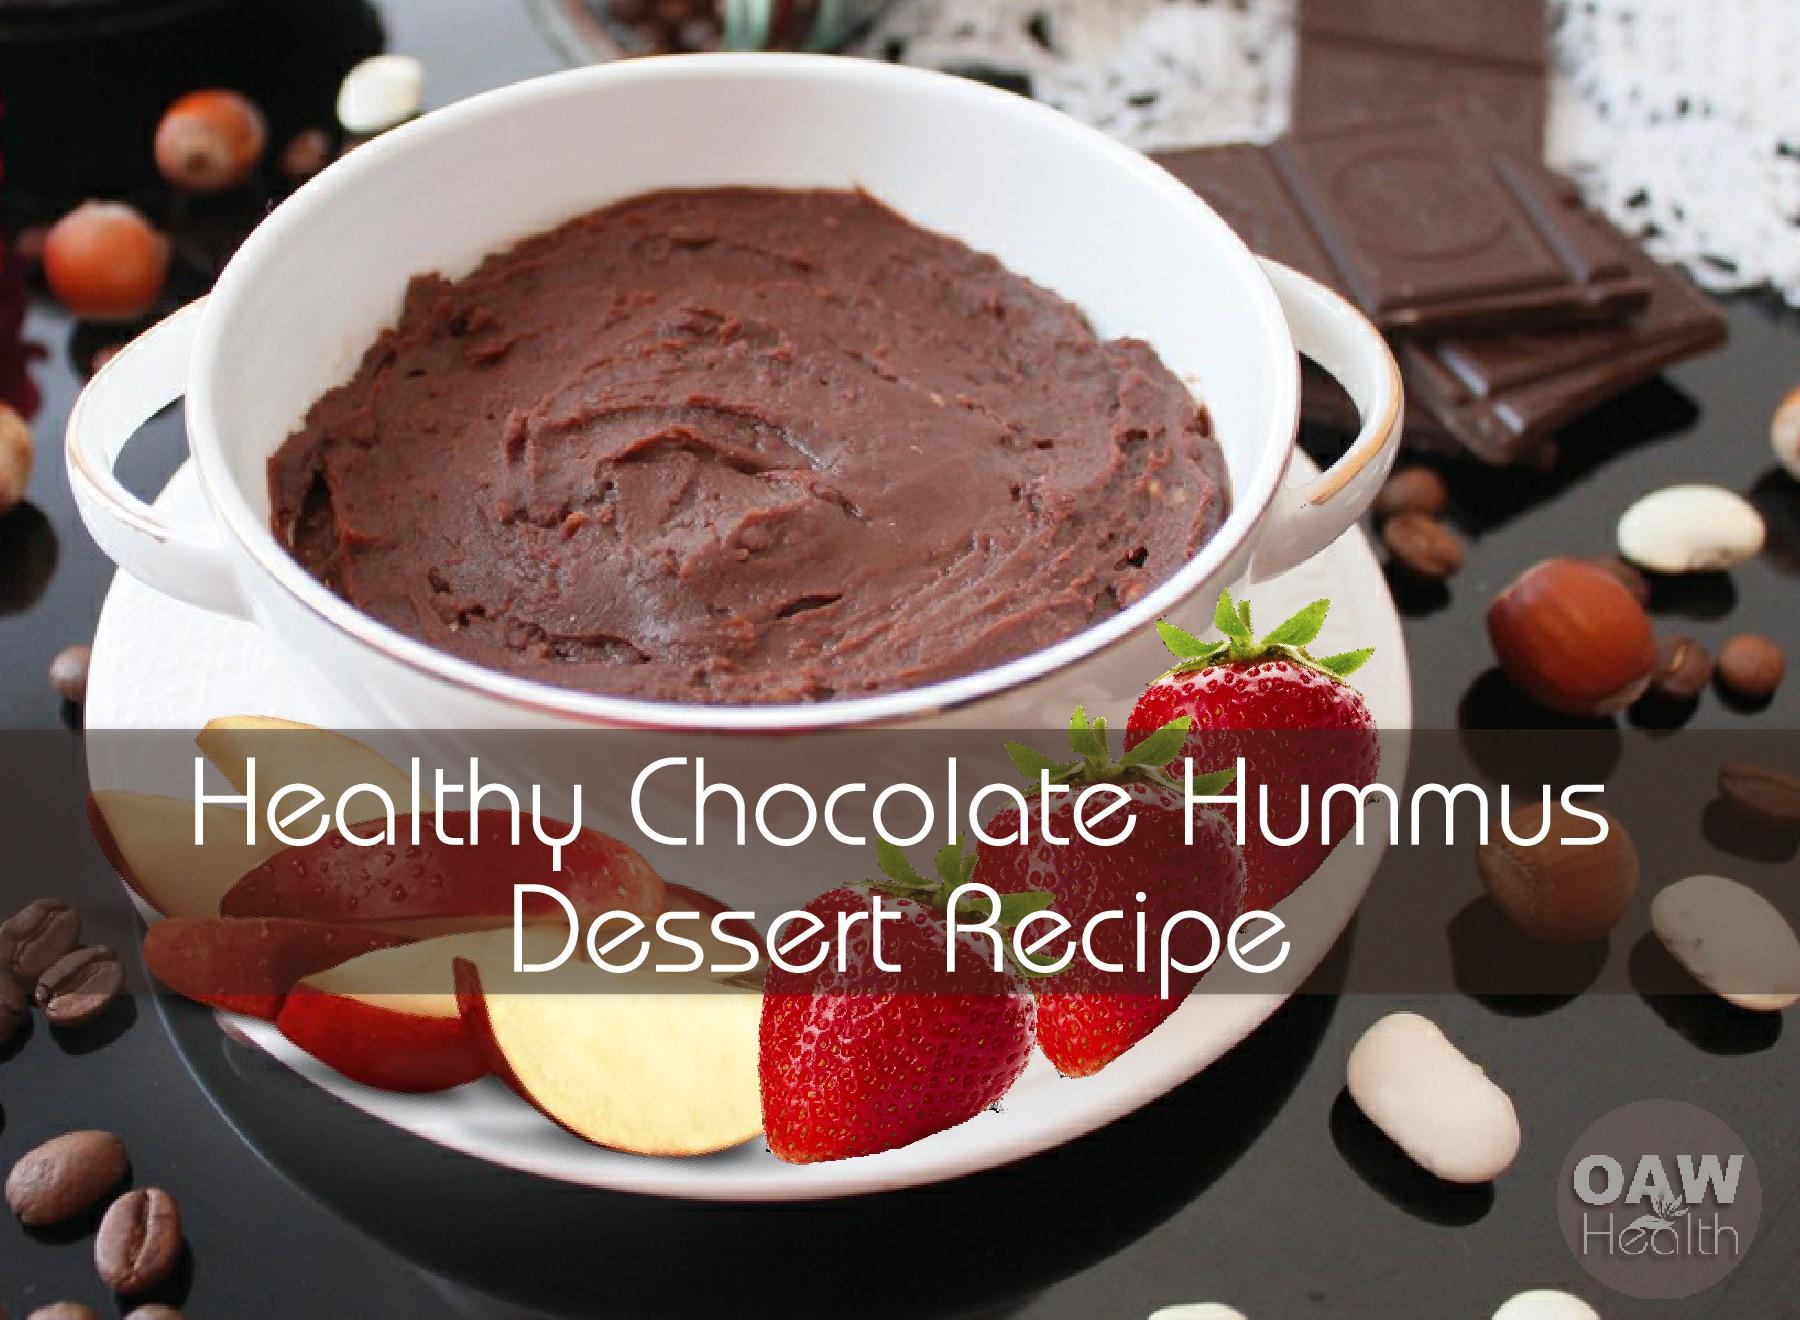 Healthy Chocolate Hummus Dessert Recipe